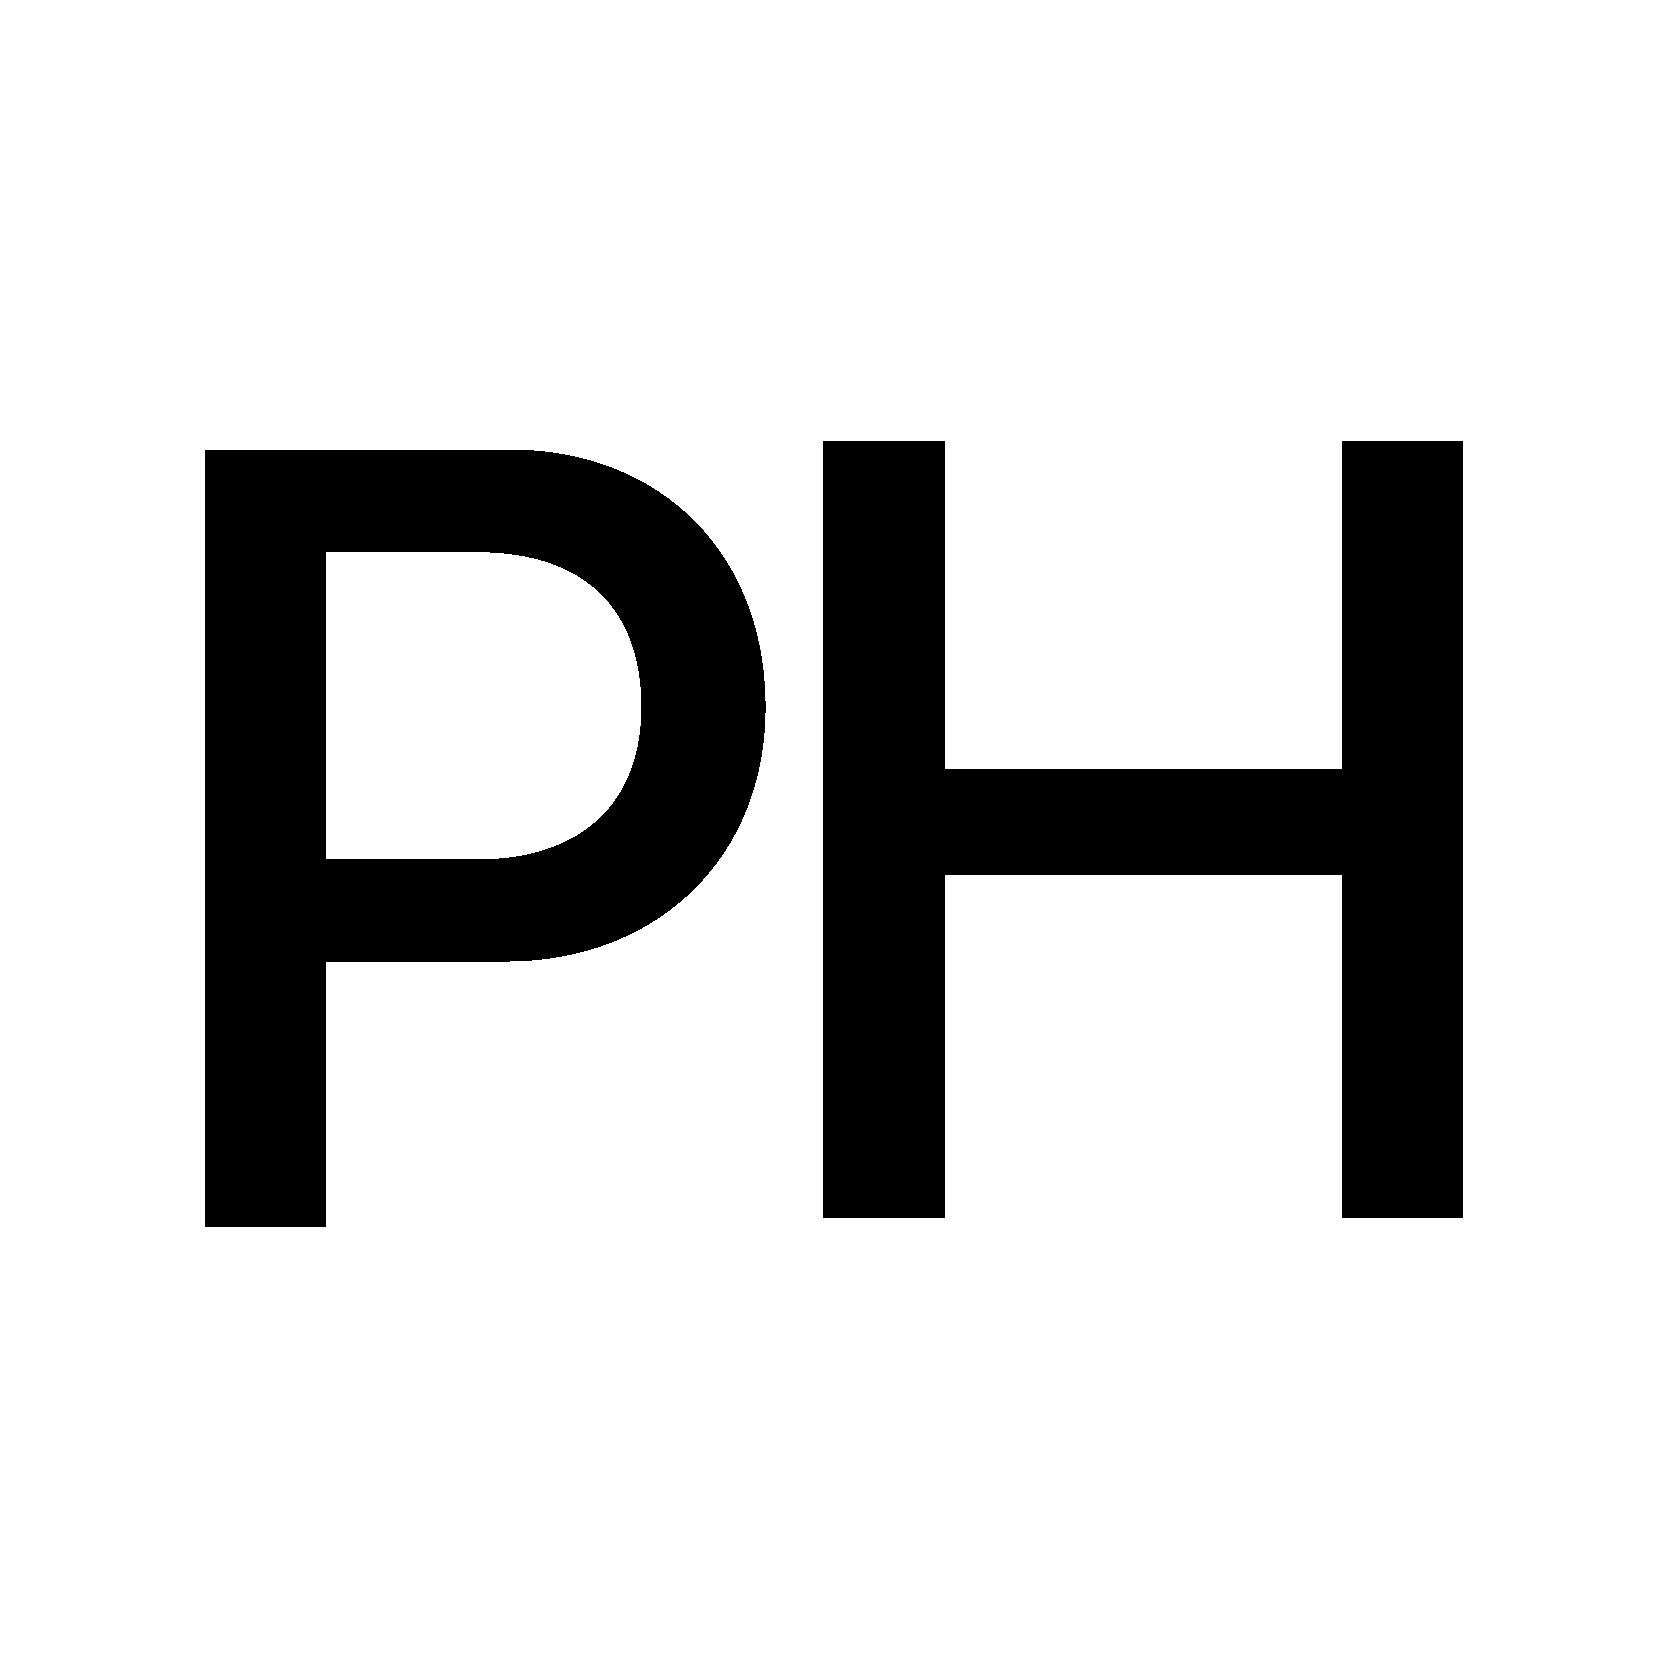 patrick Halferty